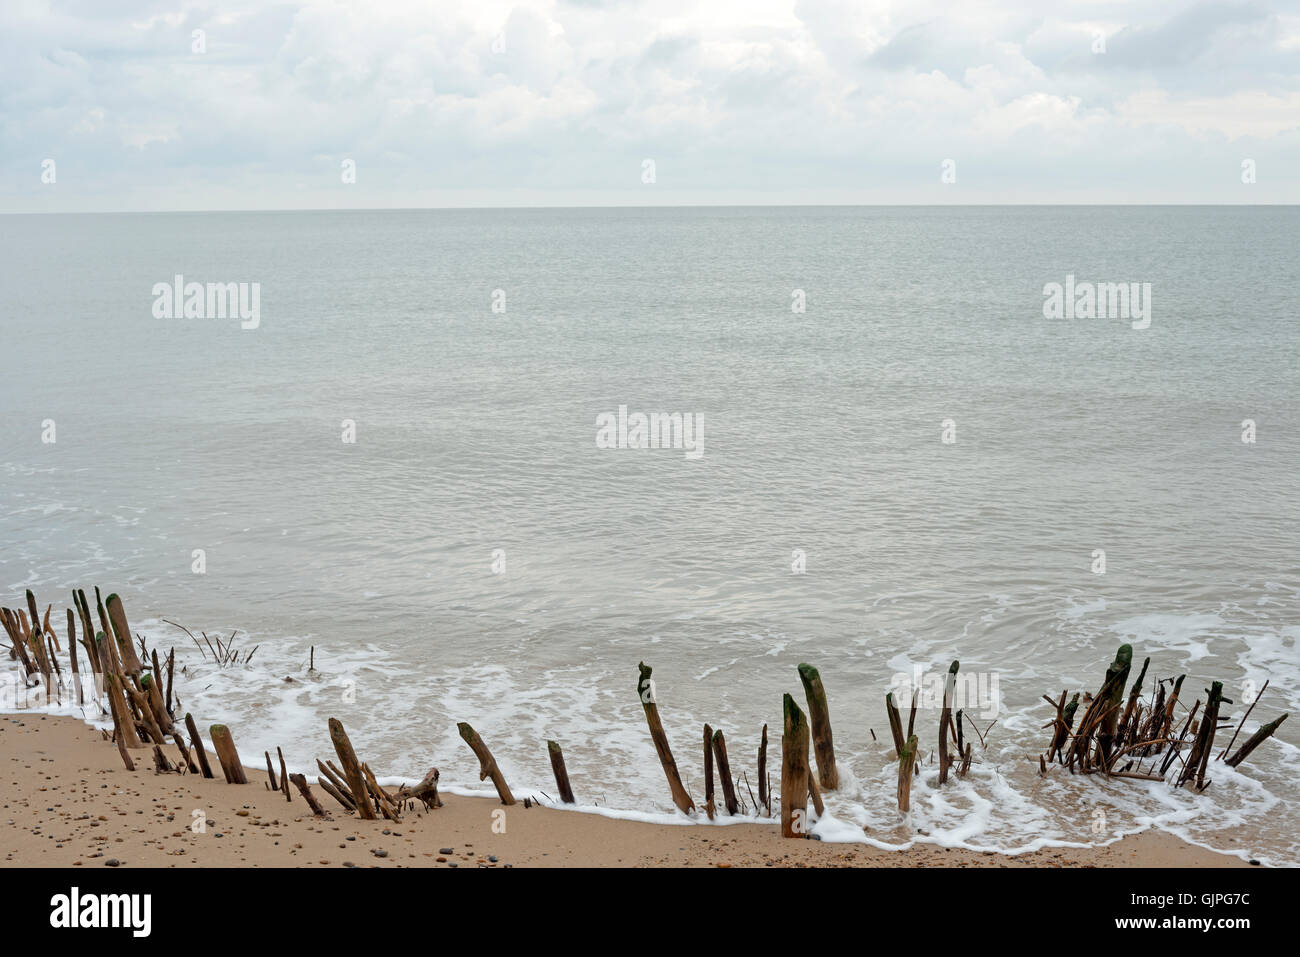 Historic wooden breakwaters or groynes - Stock Image